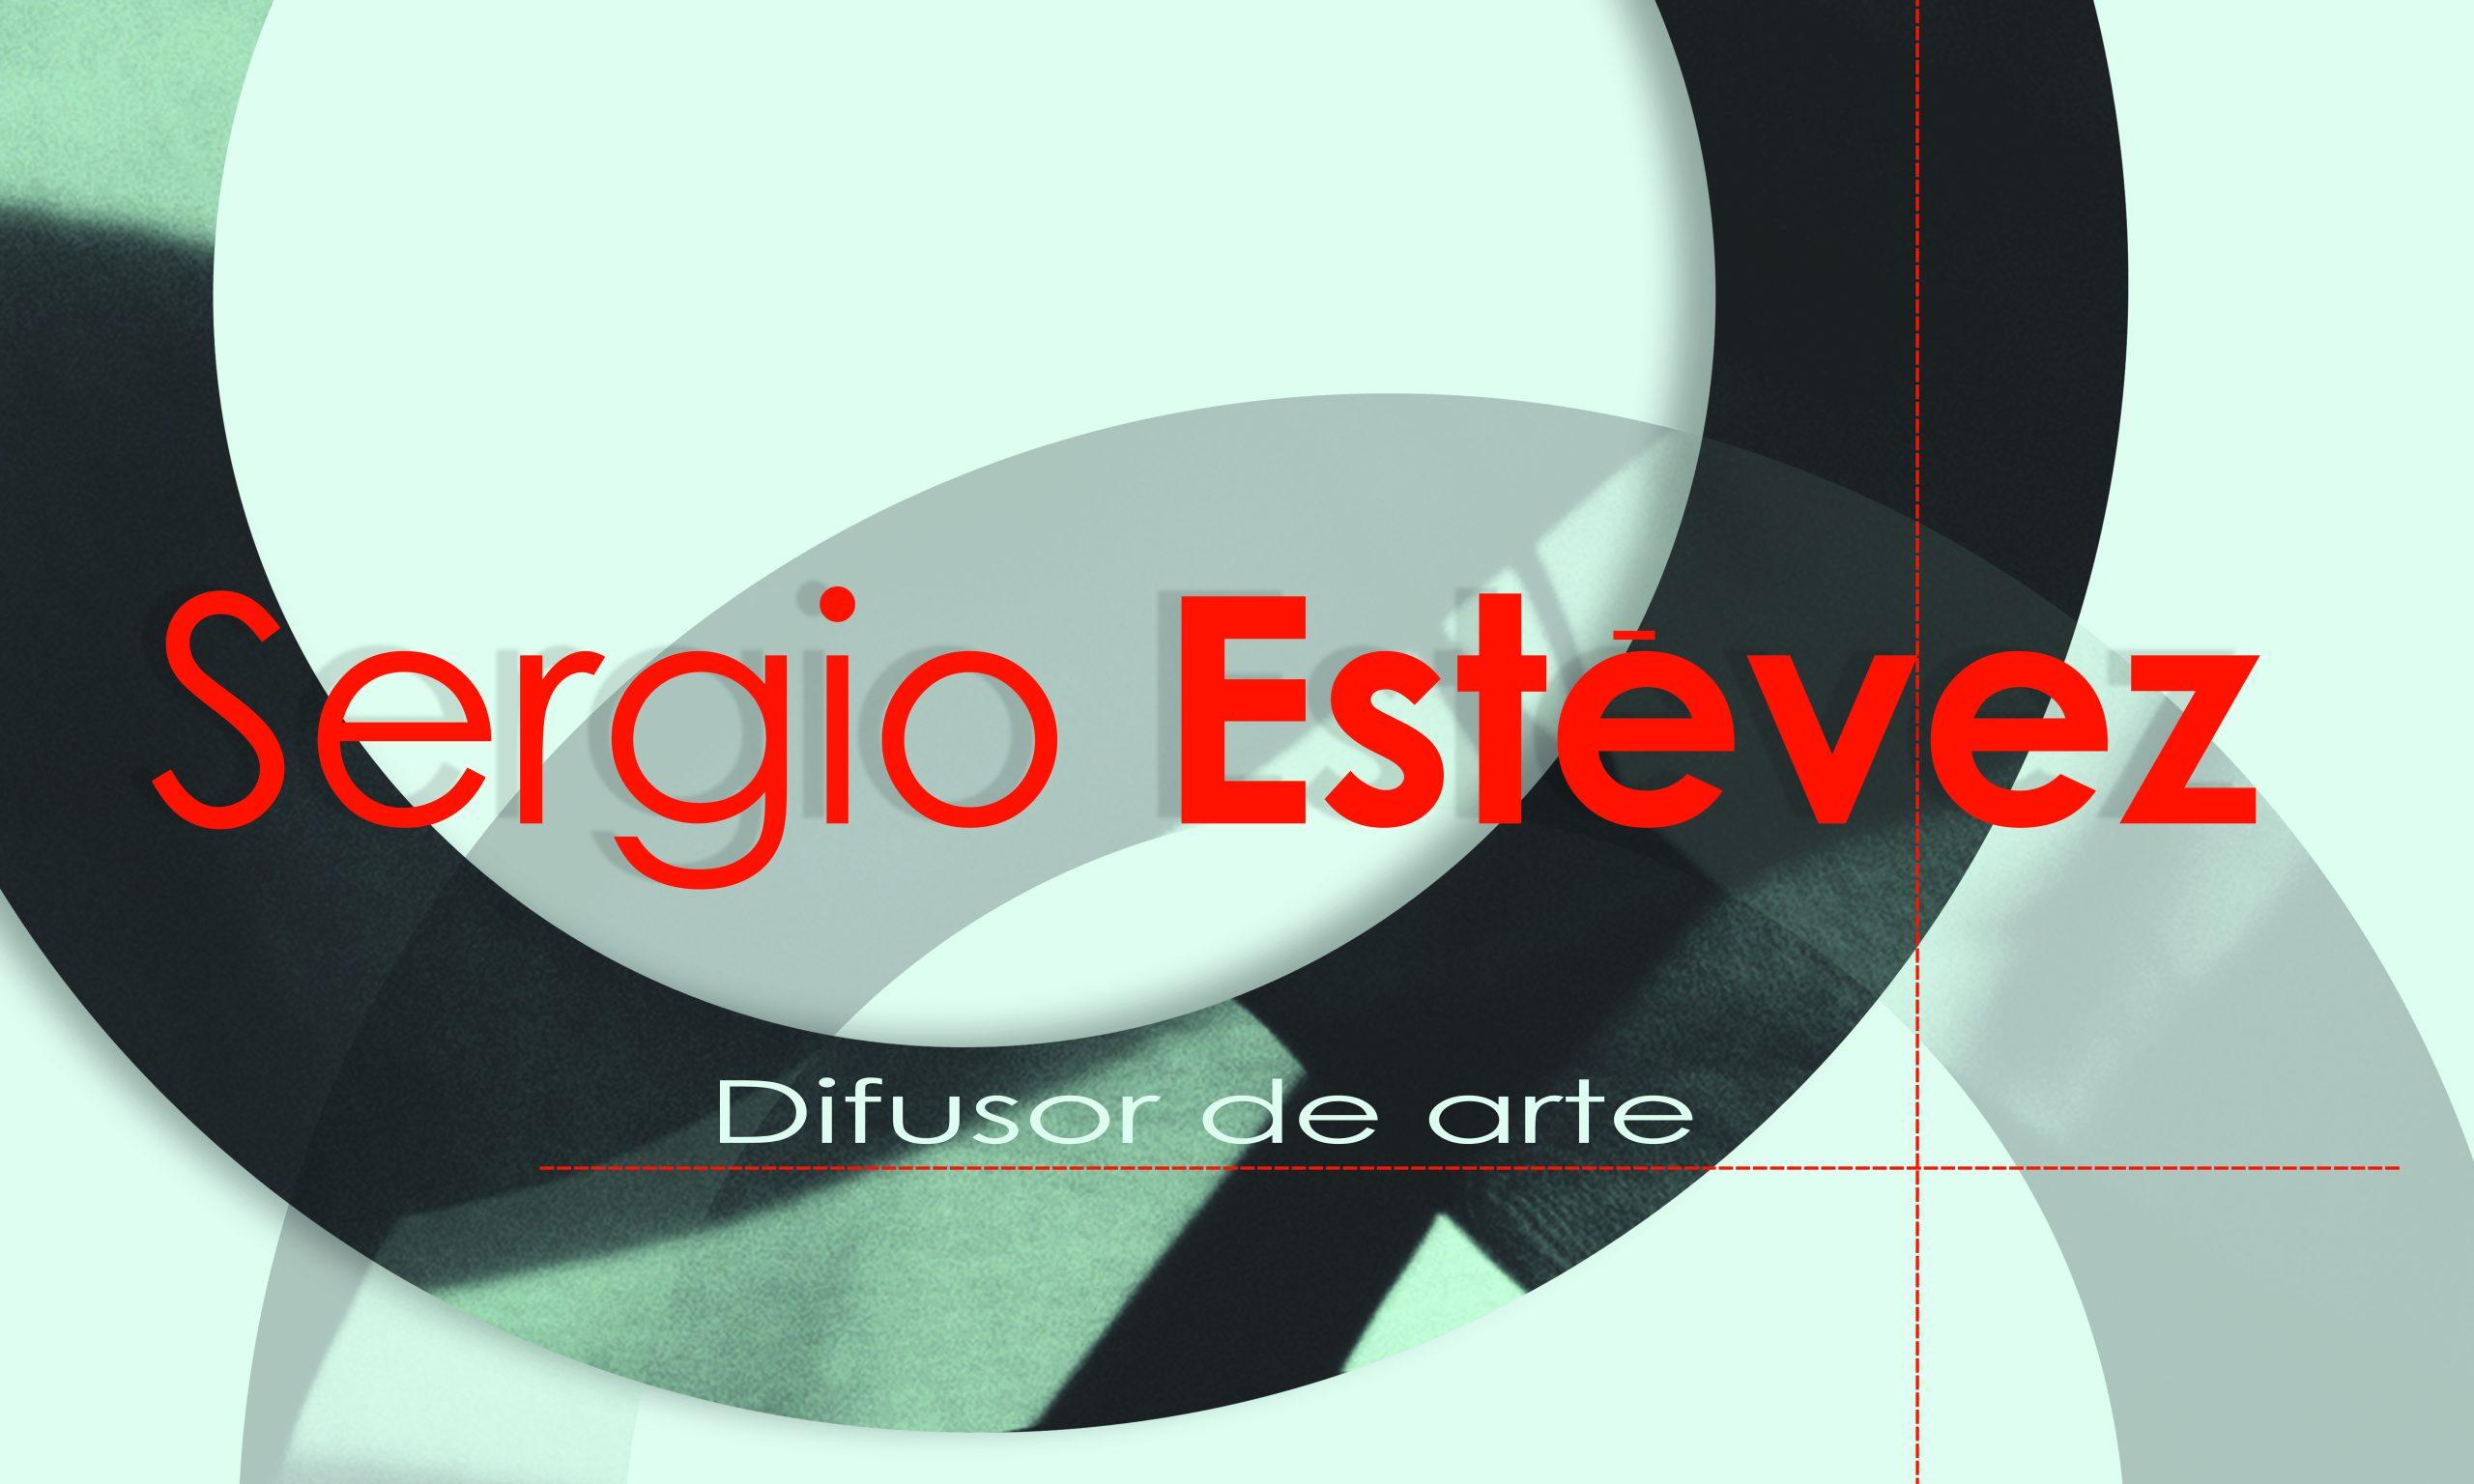 Logo Sergio Estévez difusor